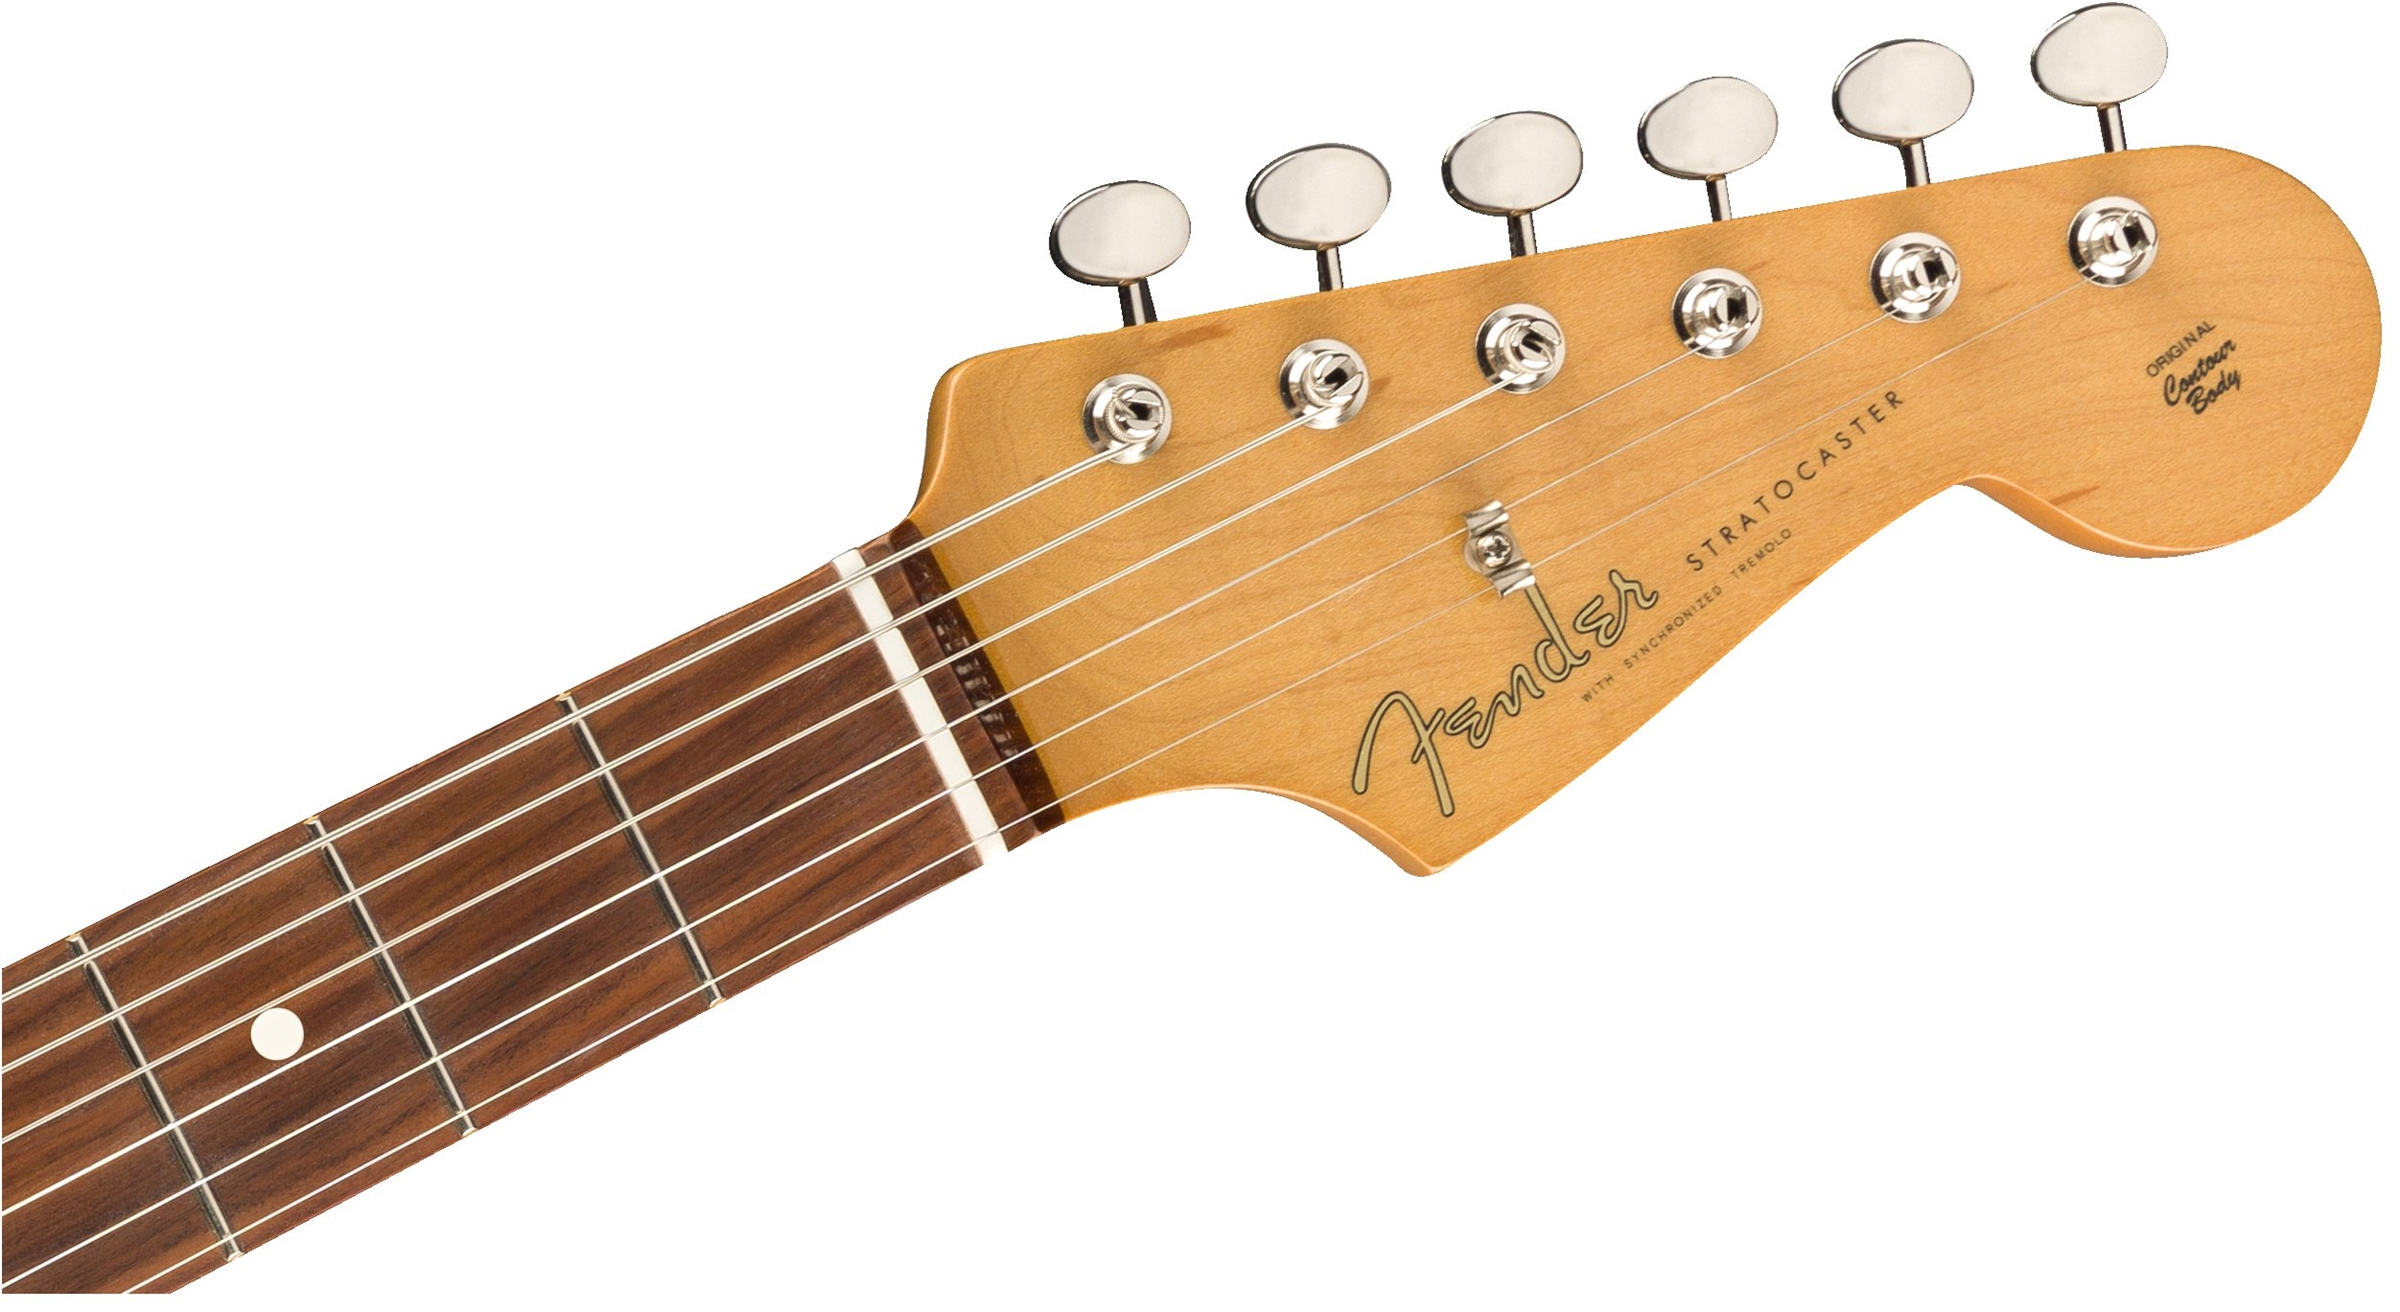 60s stratocaster wiring diagram vintera    60s stratocaster   electric guitars  vintera    60s stratocaster   electric